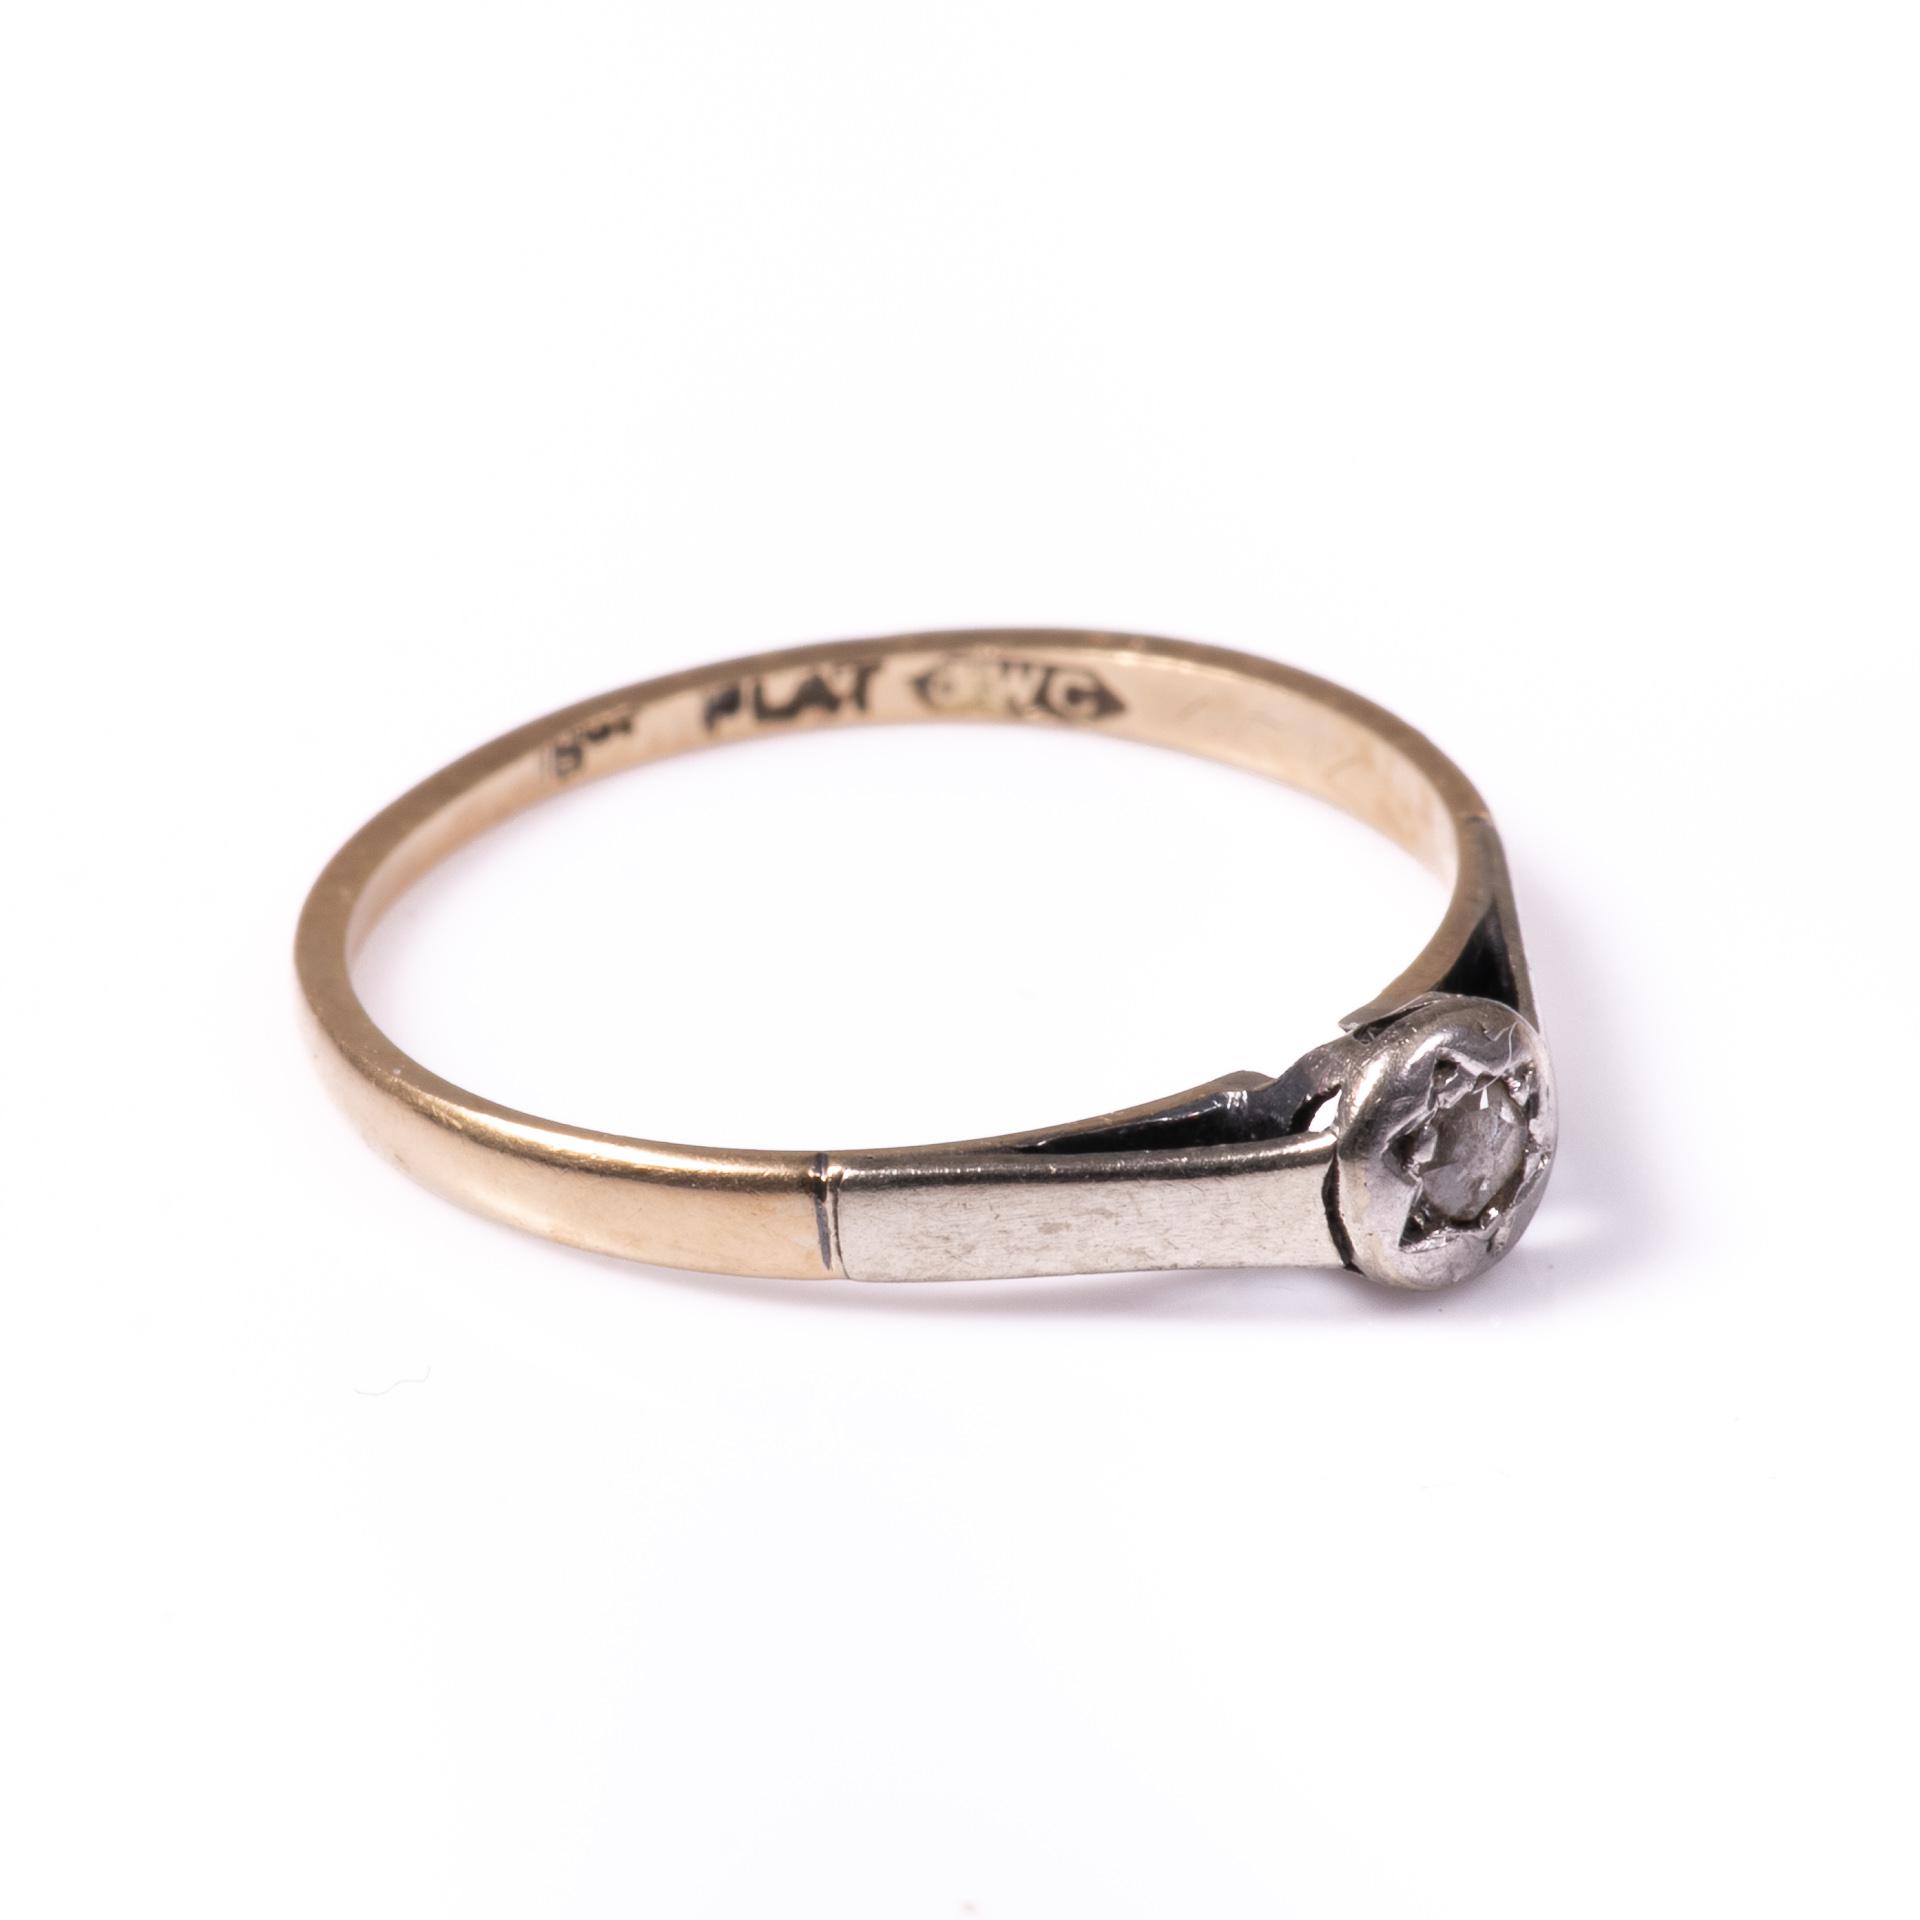 18ct Gold & Platinum Rose Cut Diamond Ring - Image 6 of 7